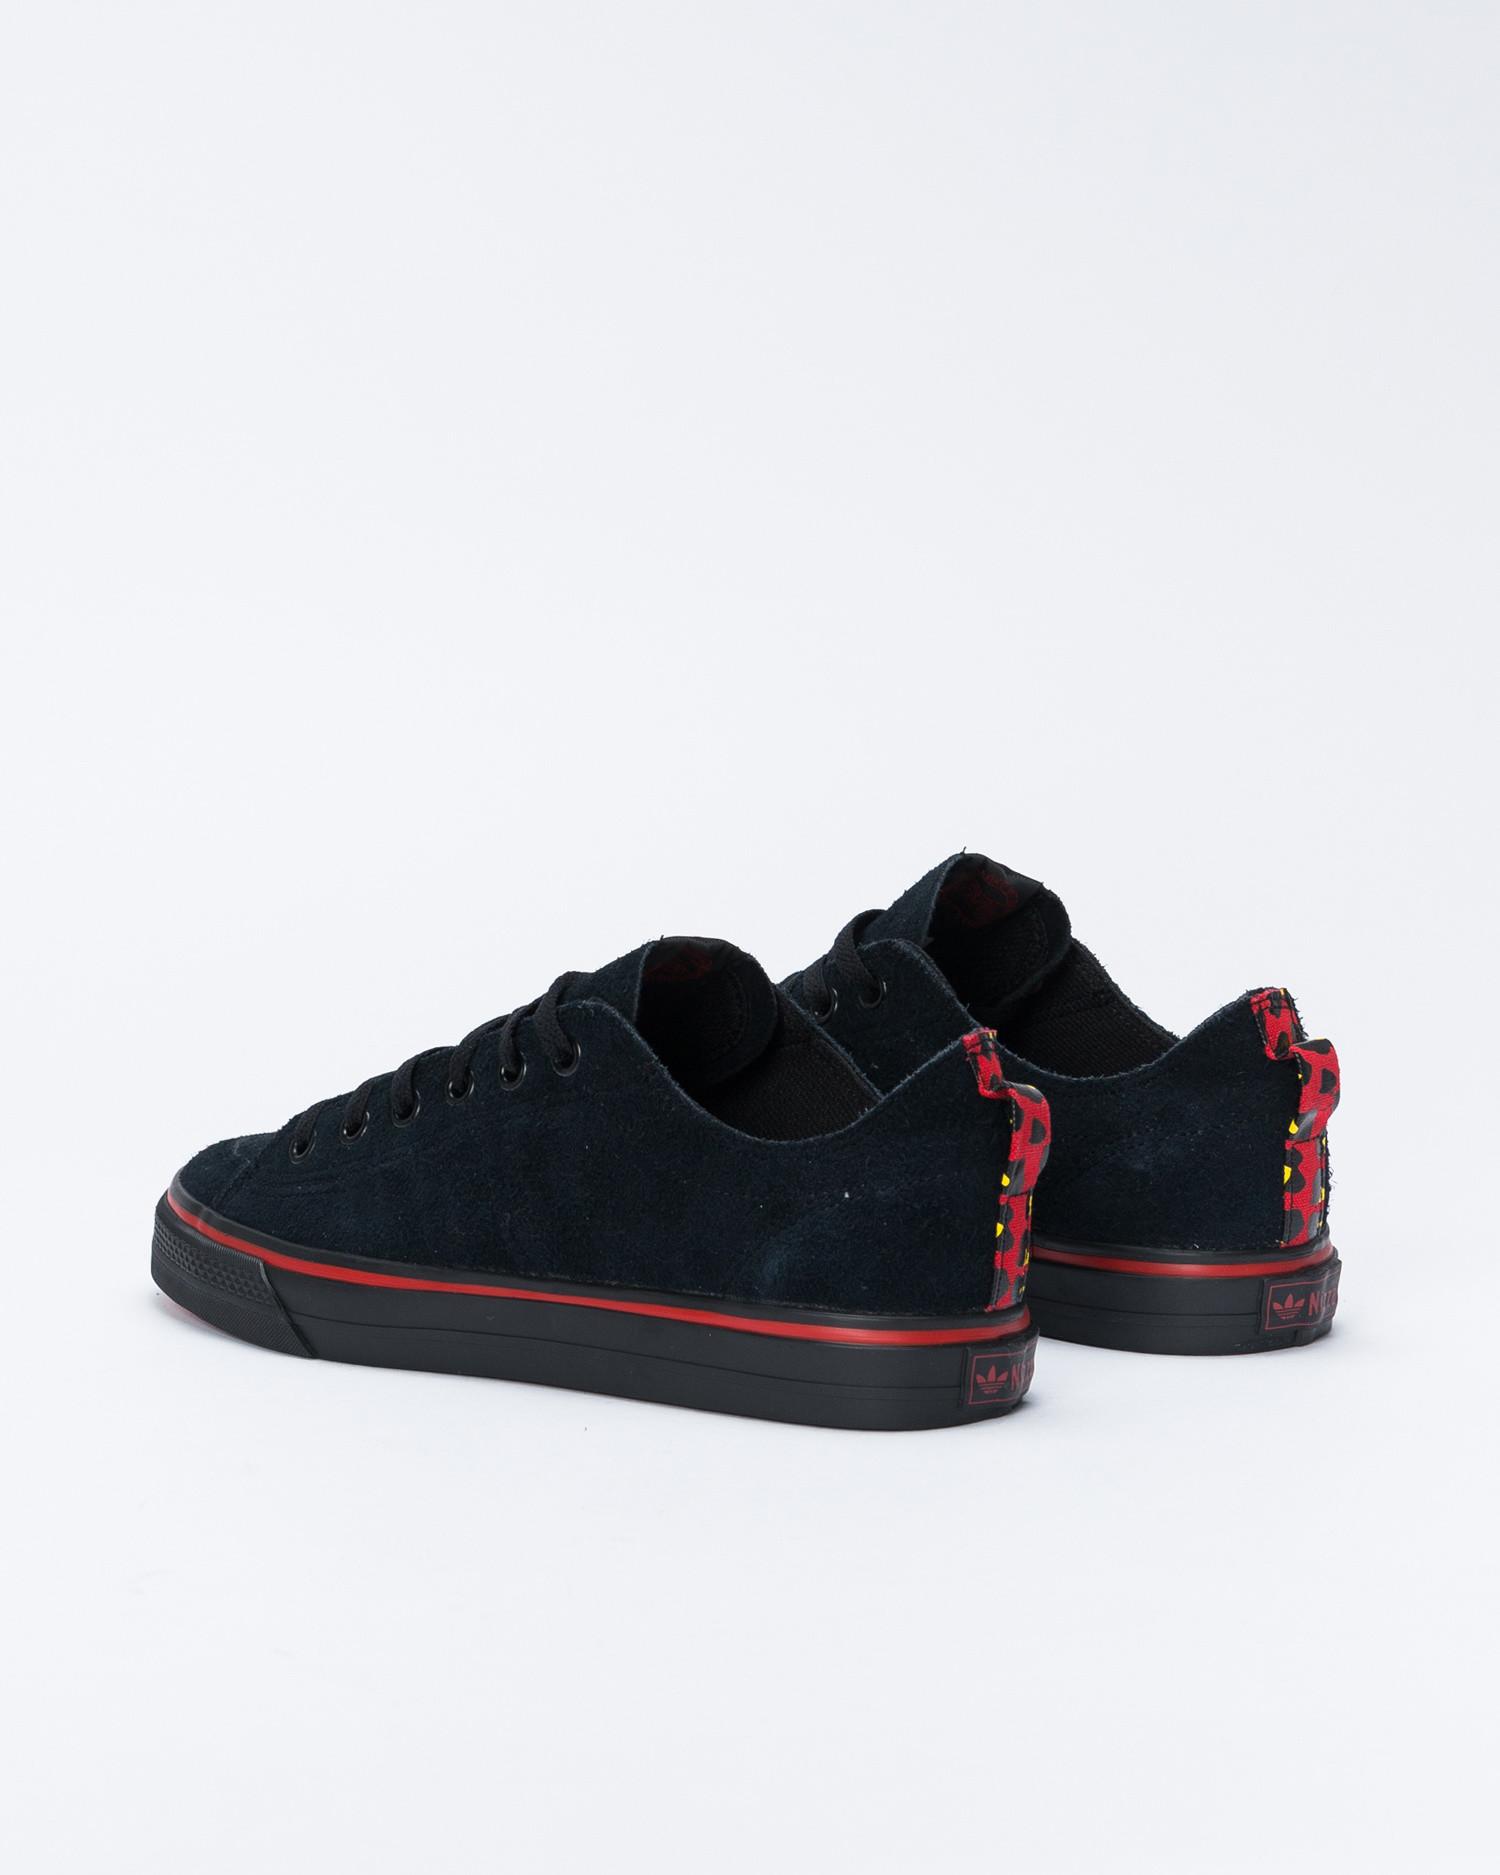 Adidas Nizza RFS  Cblack/Scarle/Ftwwht